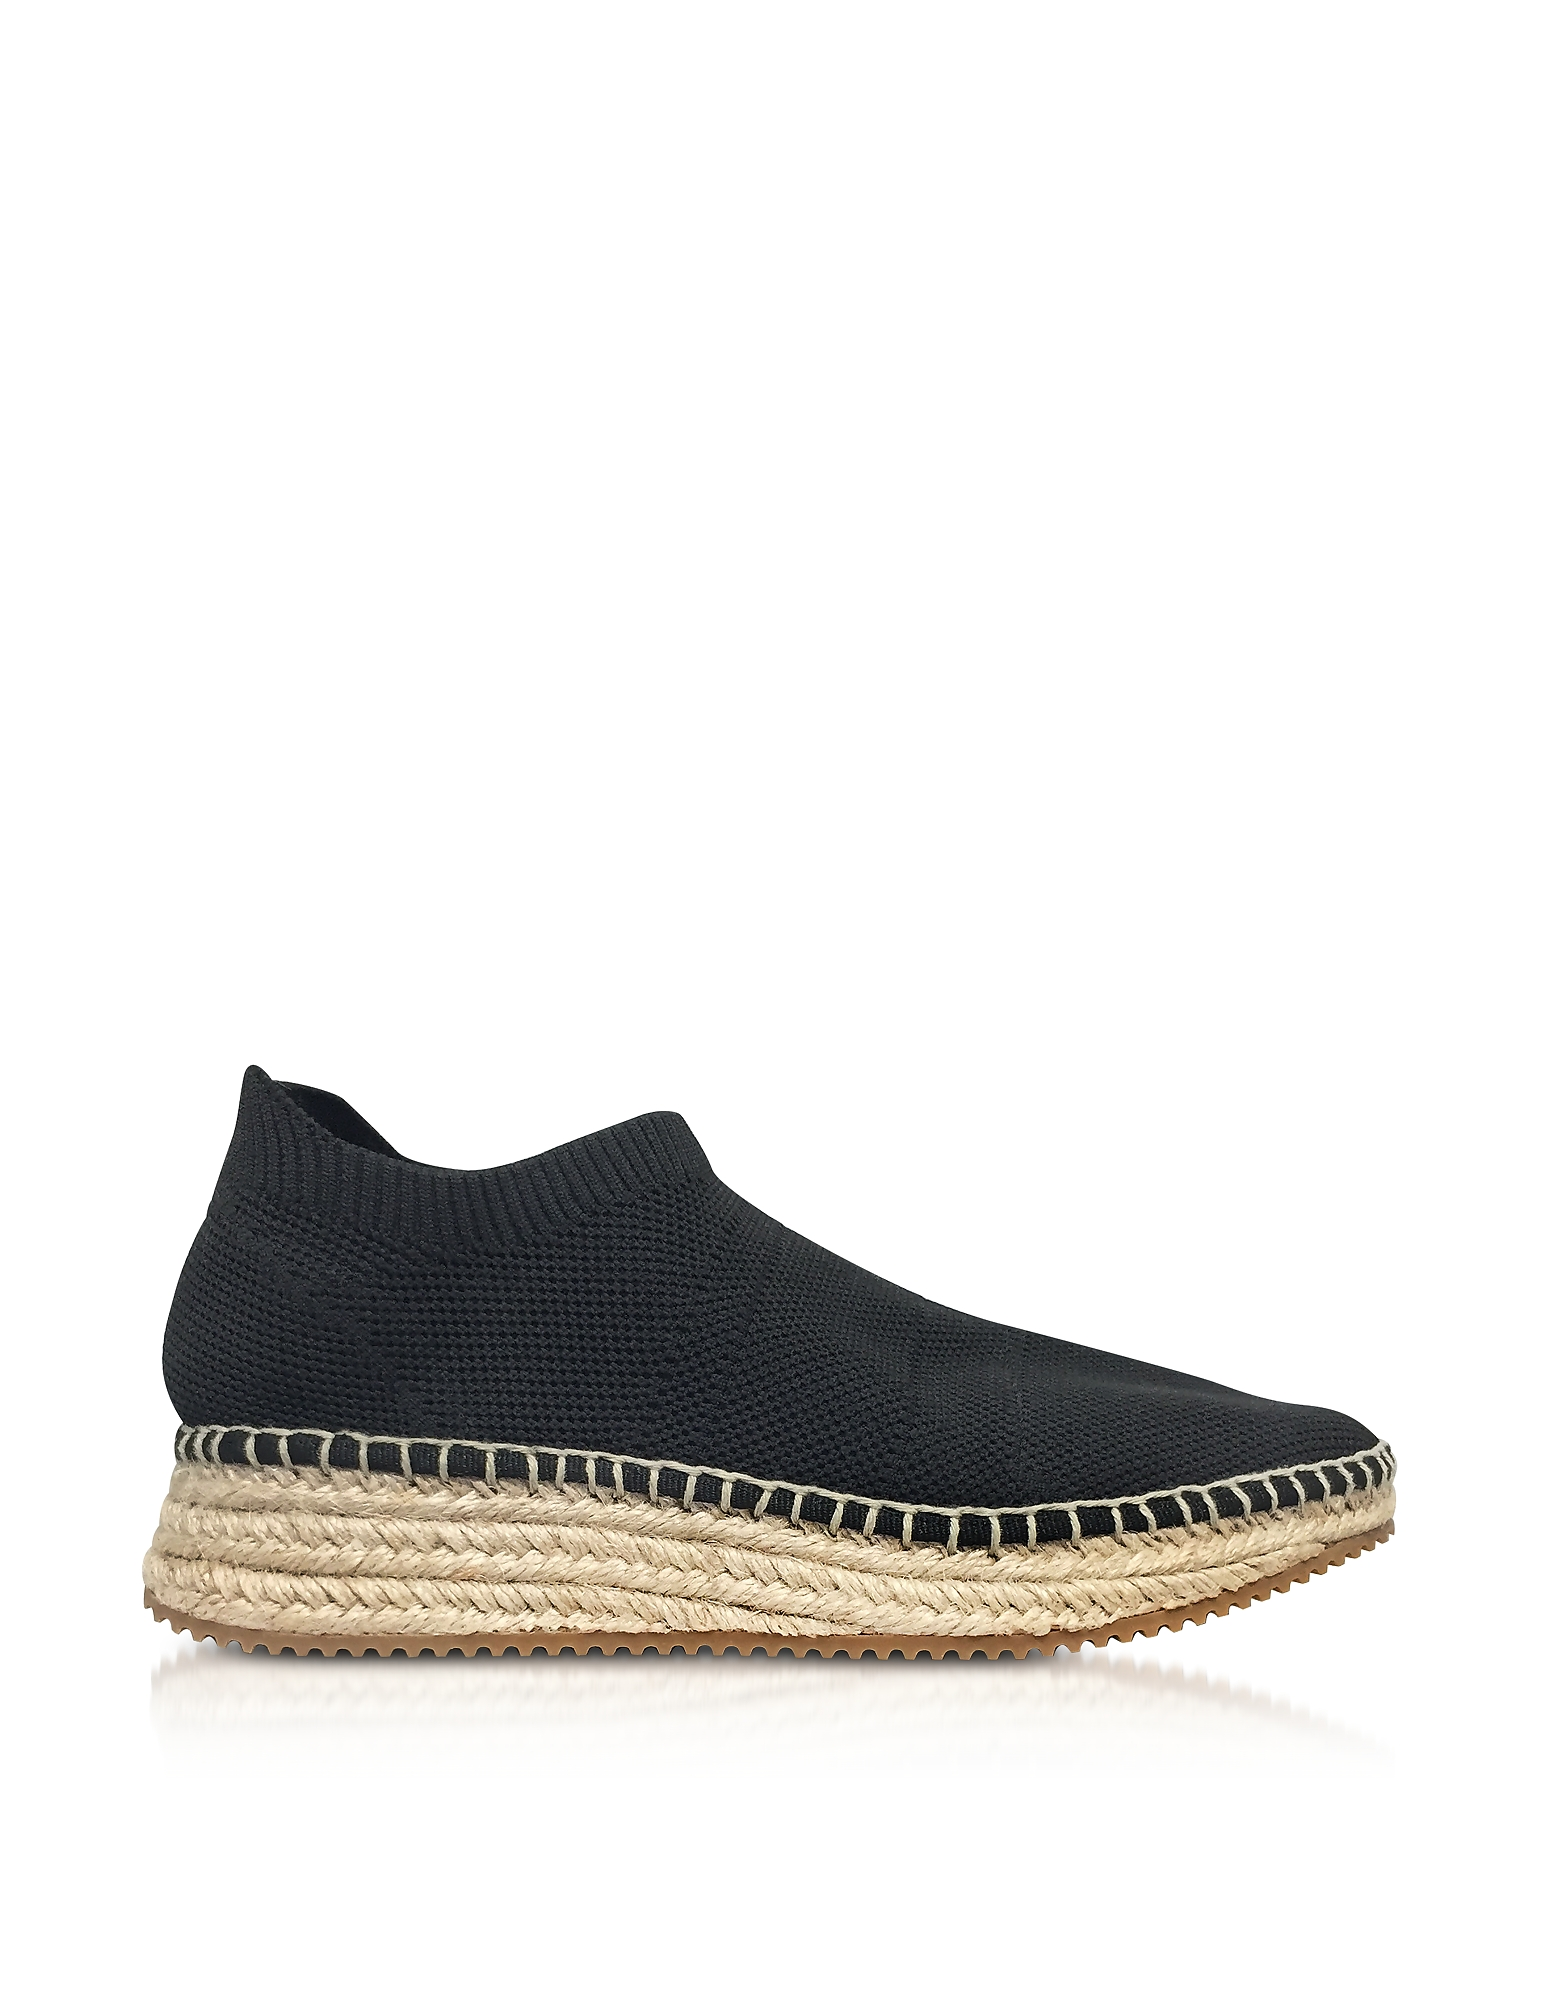 Alexander Wang Shoes, Dylan Black Knit Low Top Sneakers w/Jute Sole